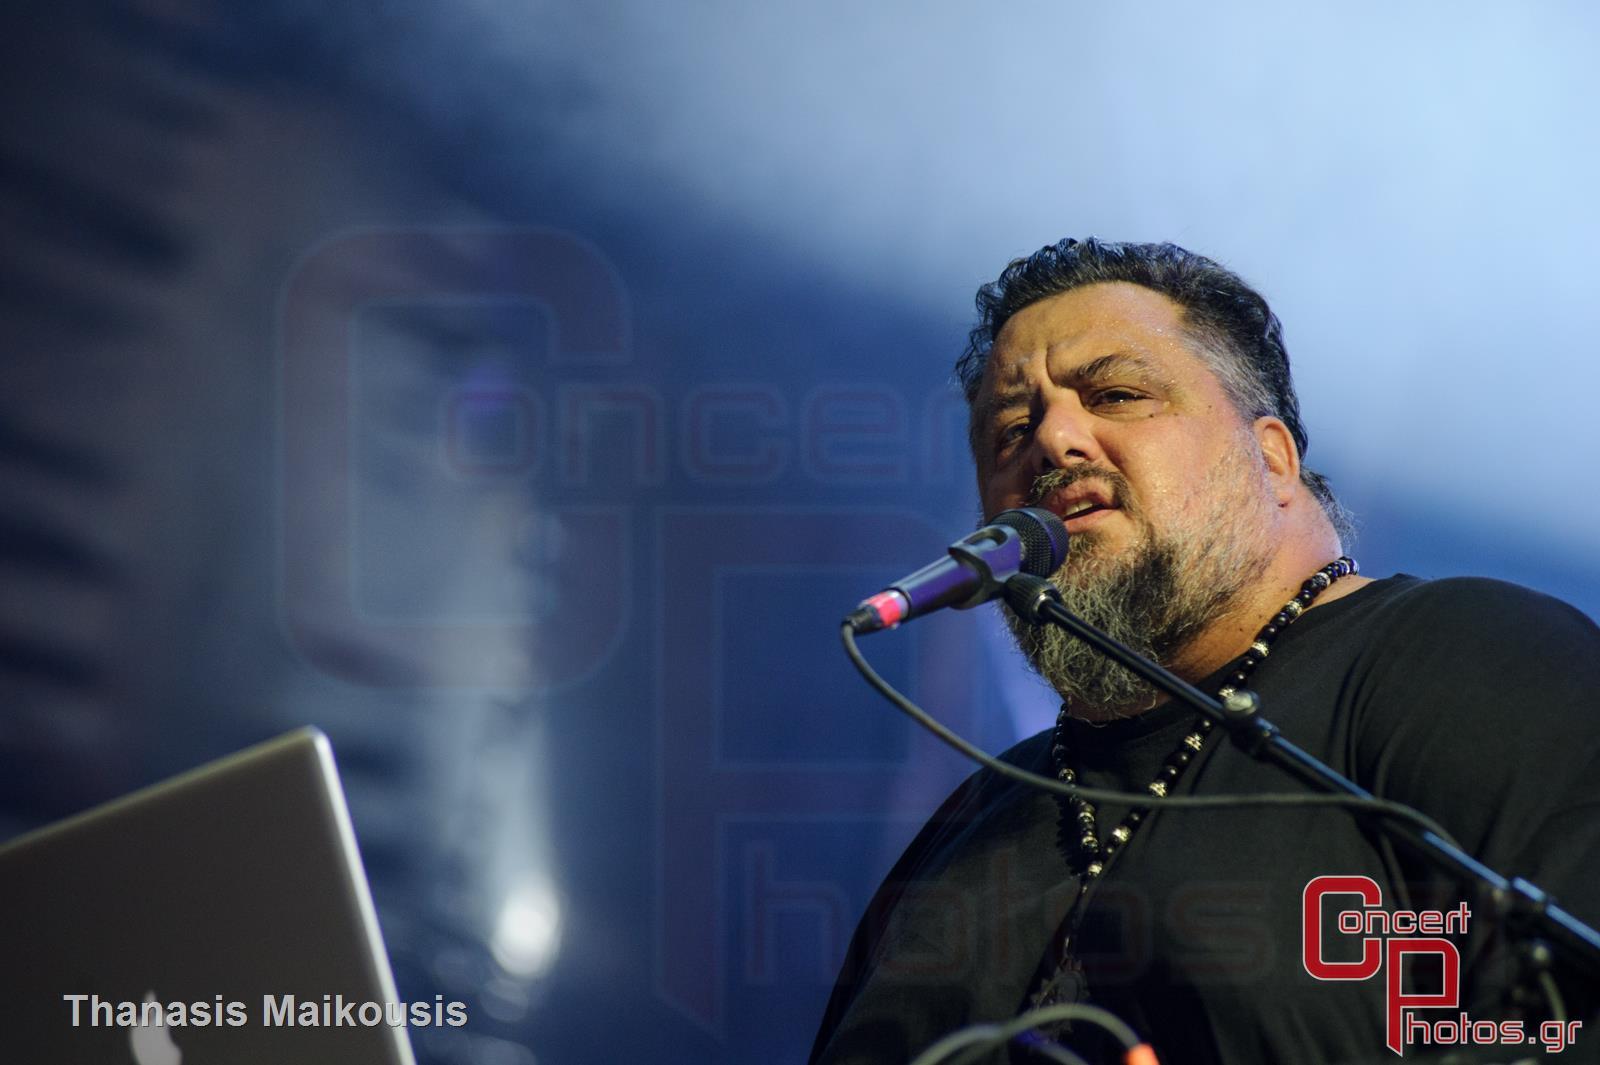 Active Member - Τραγούδα μας να φύγει το σκοτάδι- photographer: Thanasis Maikousis - concertphotos_-4879